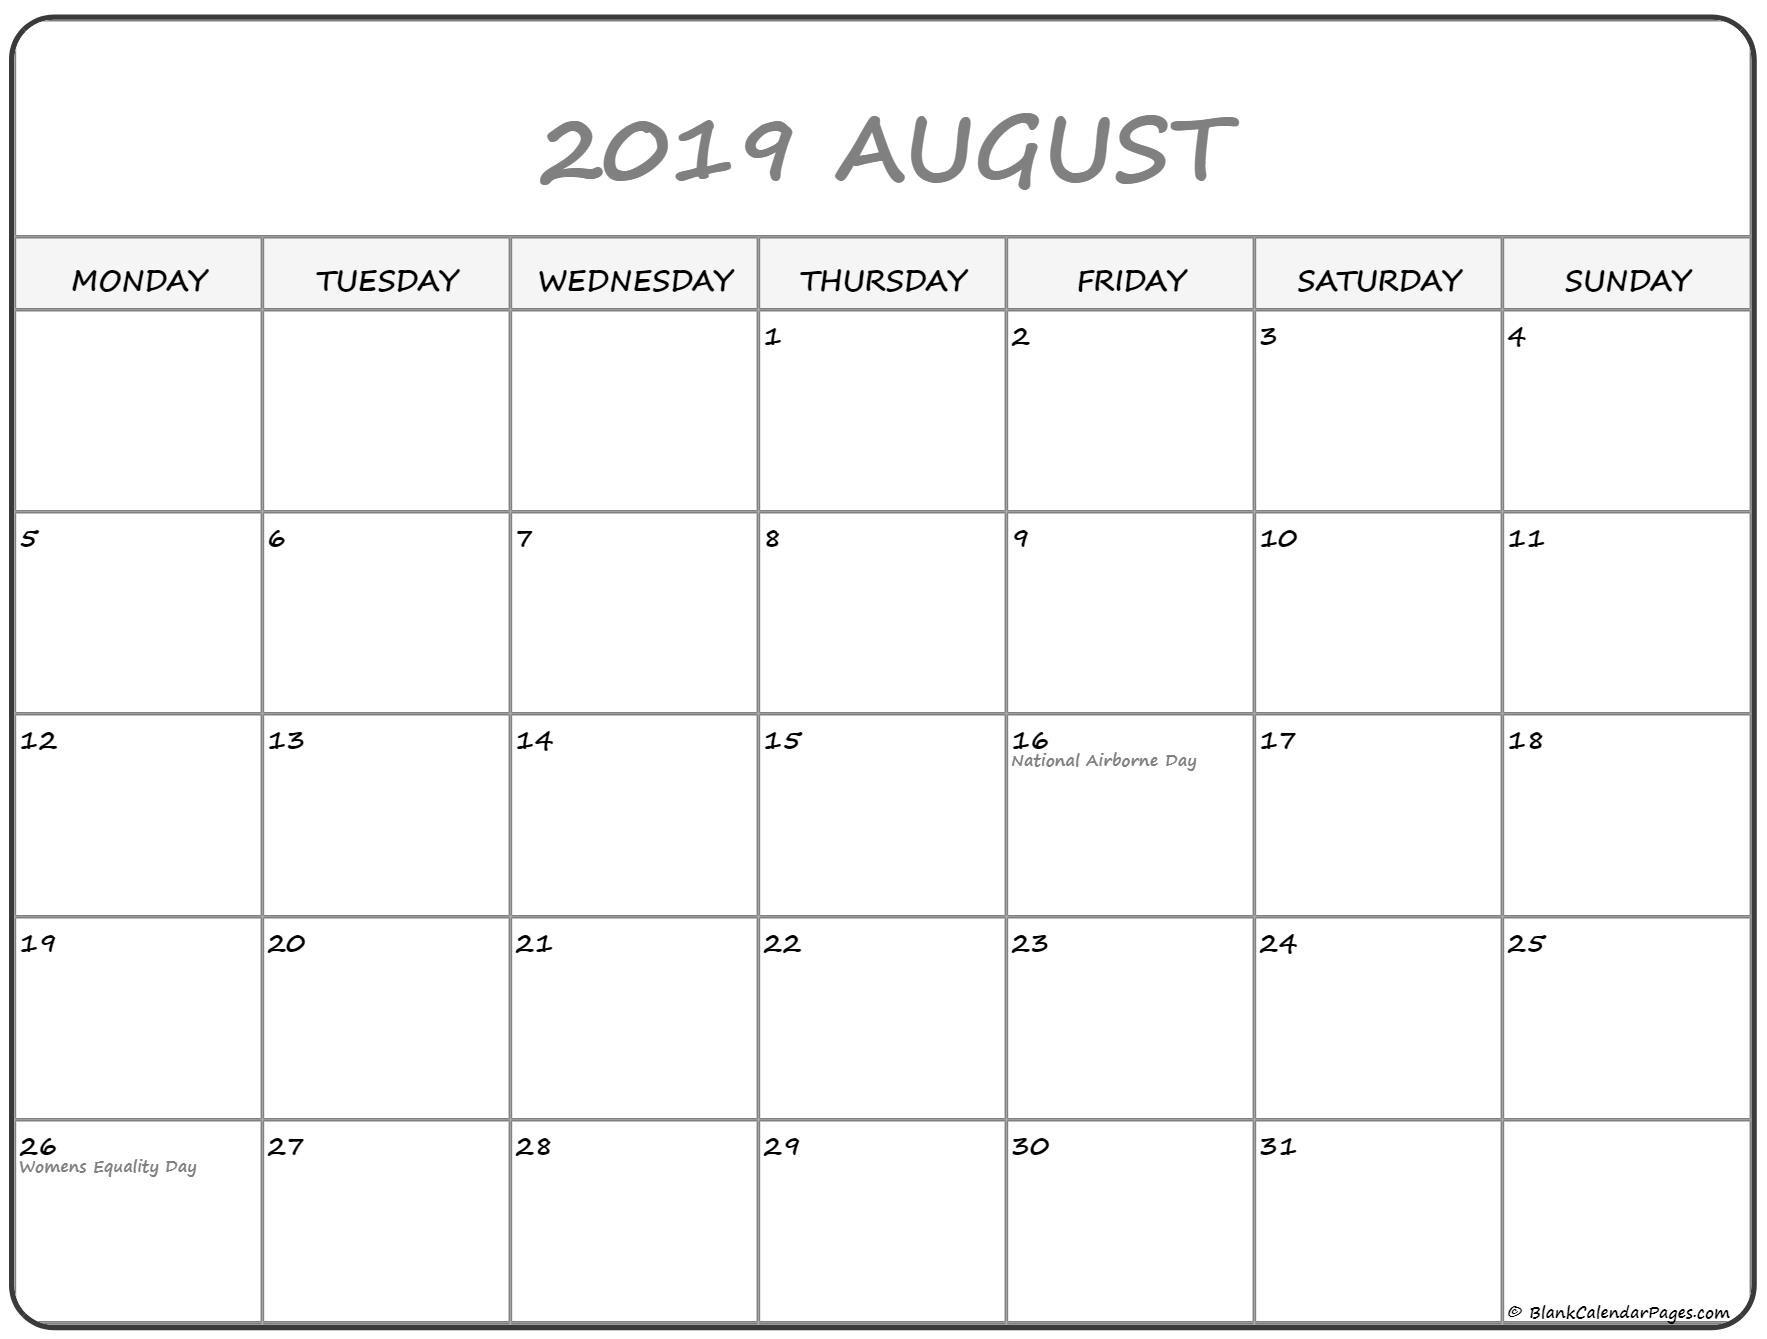 August 2019 Monday Calendar | Monday To Sunday-Blank Calendar Starting With Monday